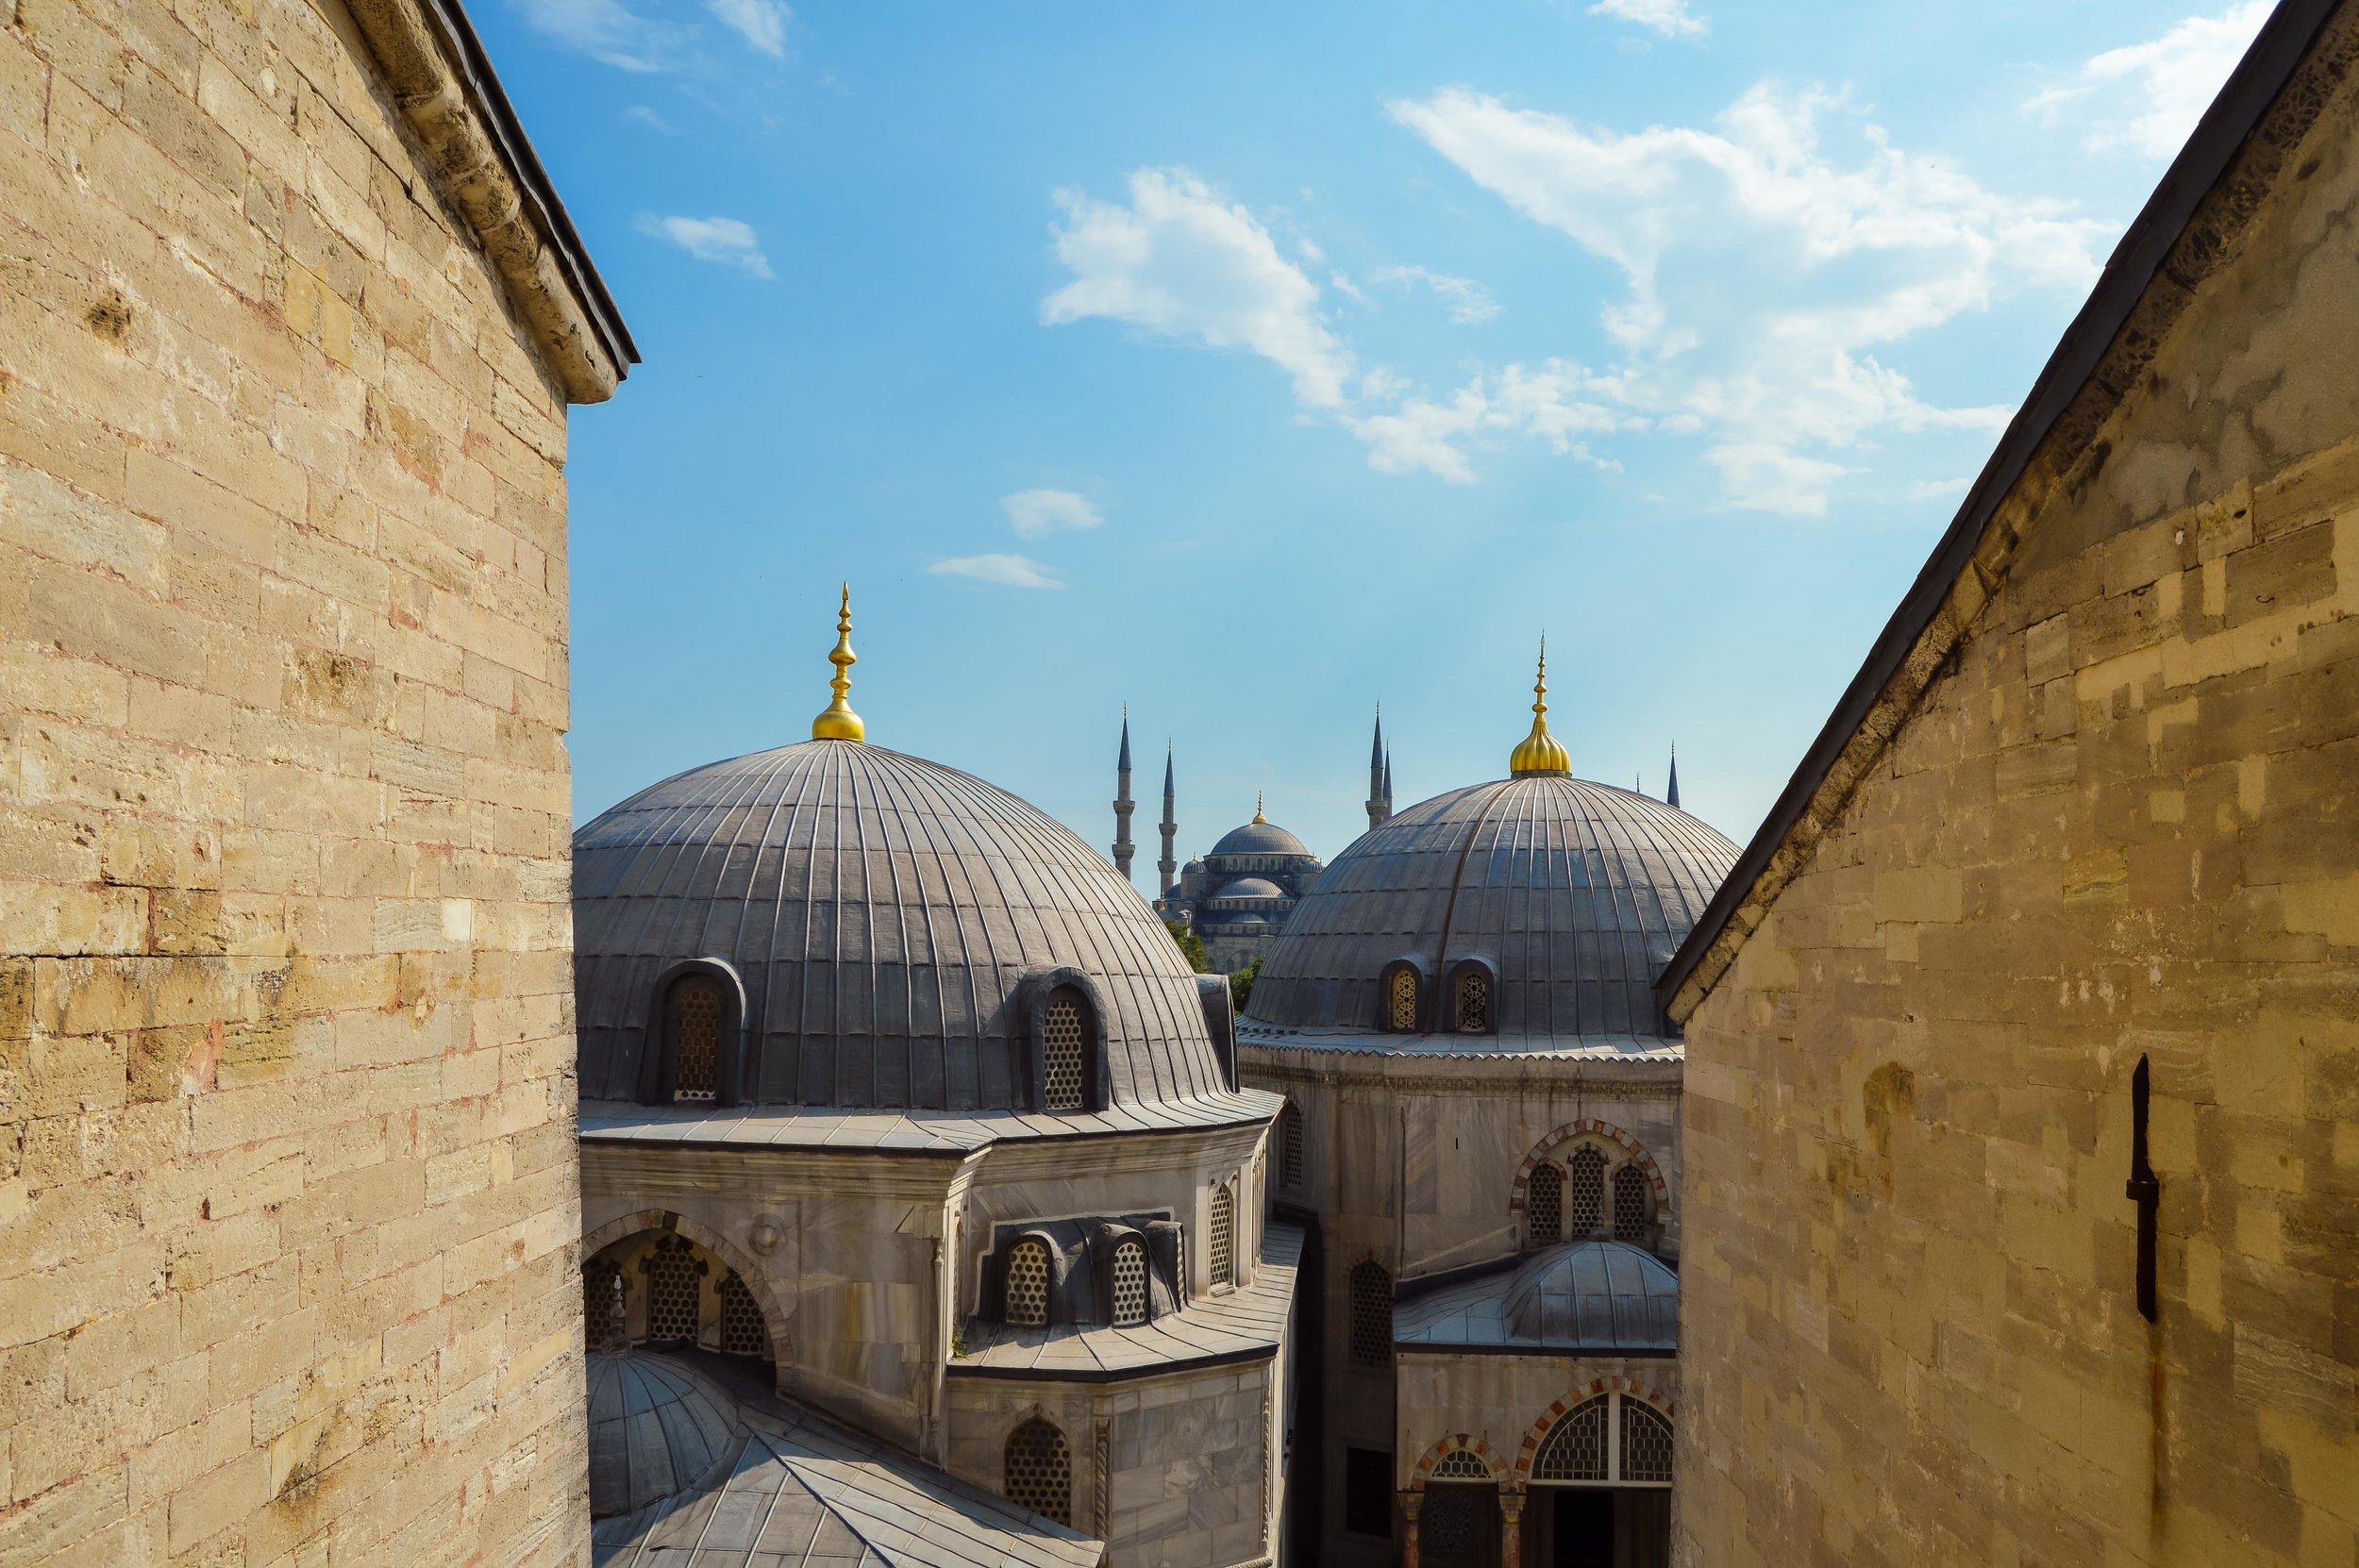 Blue Mosque Mosque Minaret Sunset Blue Sky Muslim Ottoman Empire Architecture Istanbul Turkey